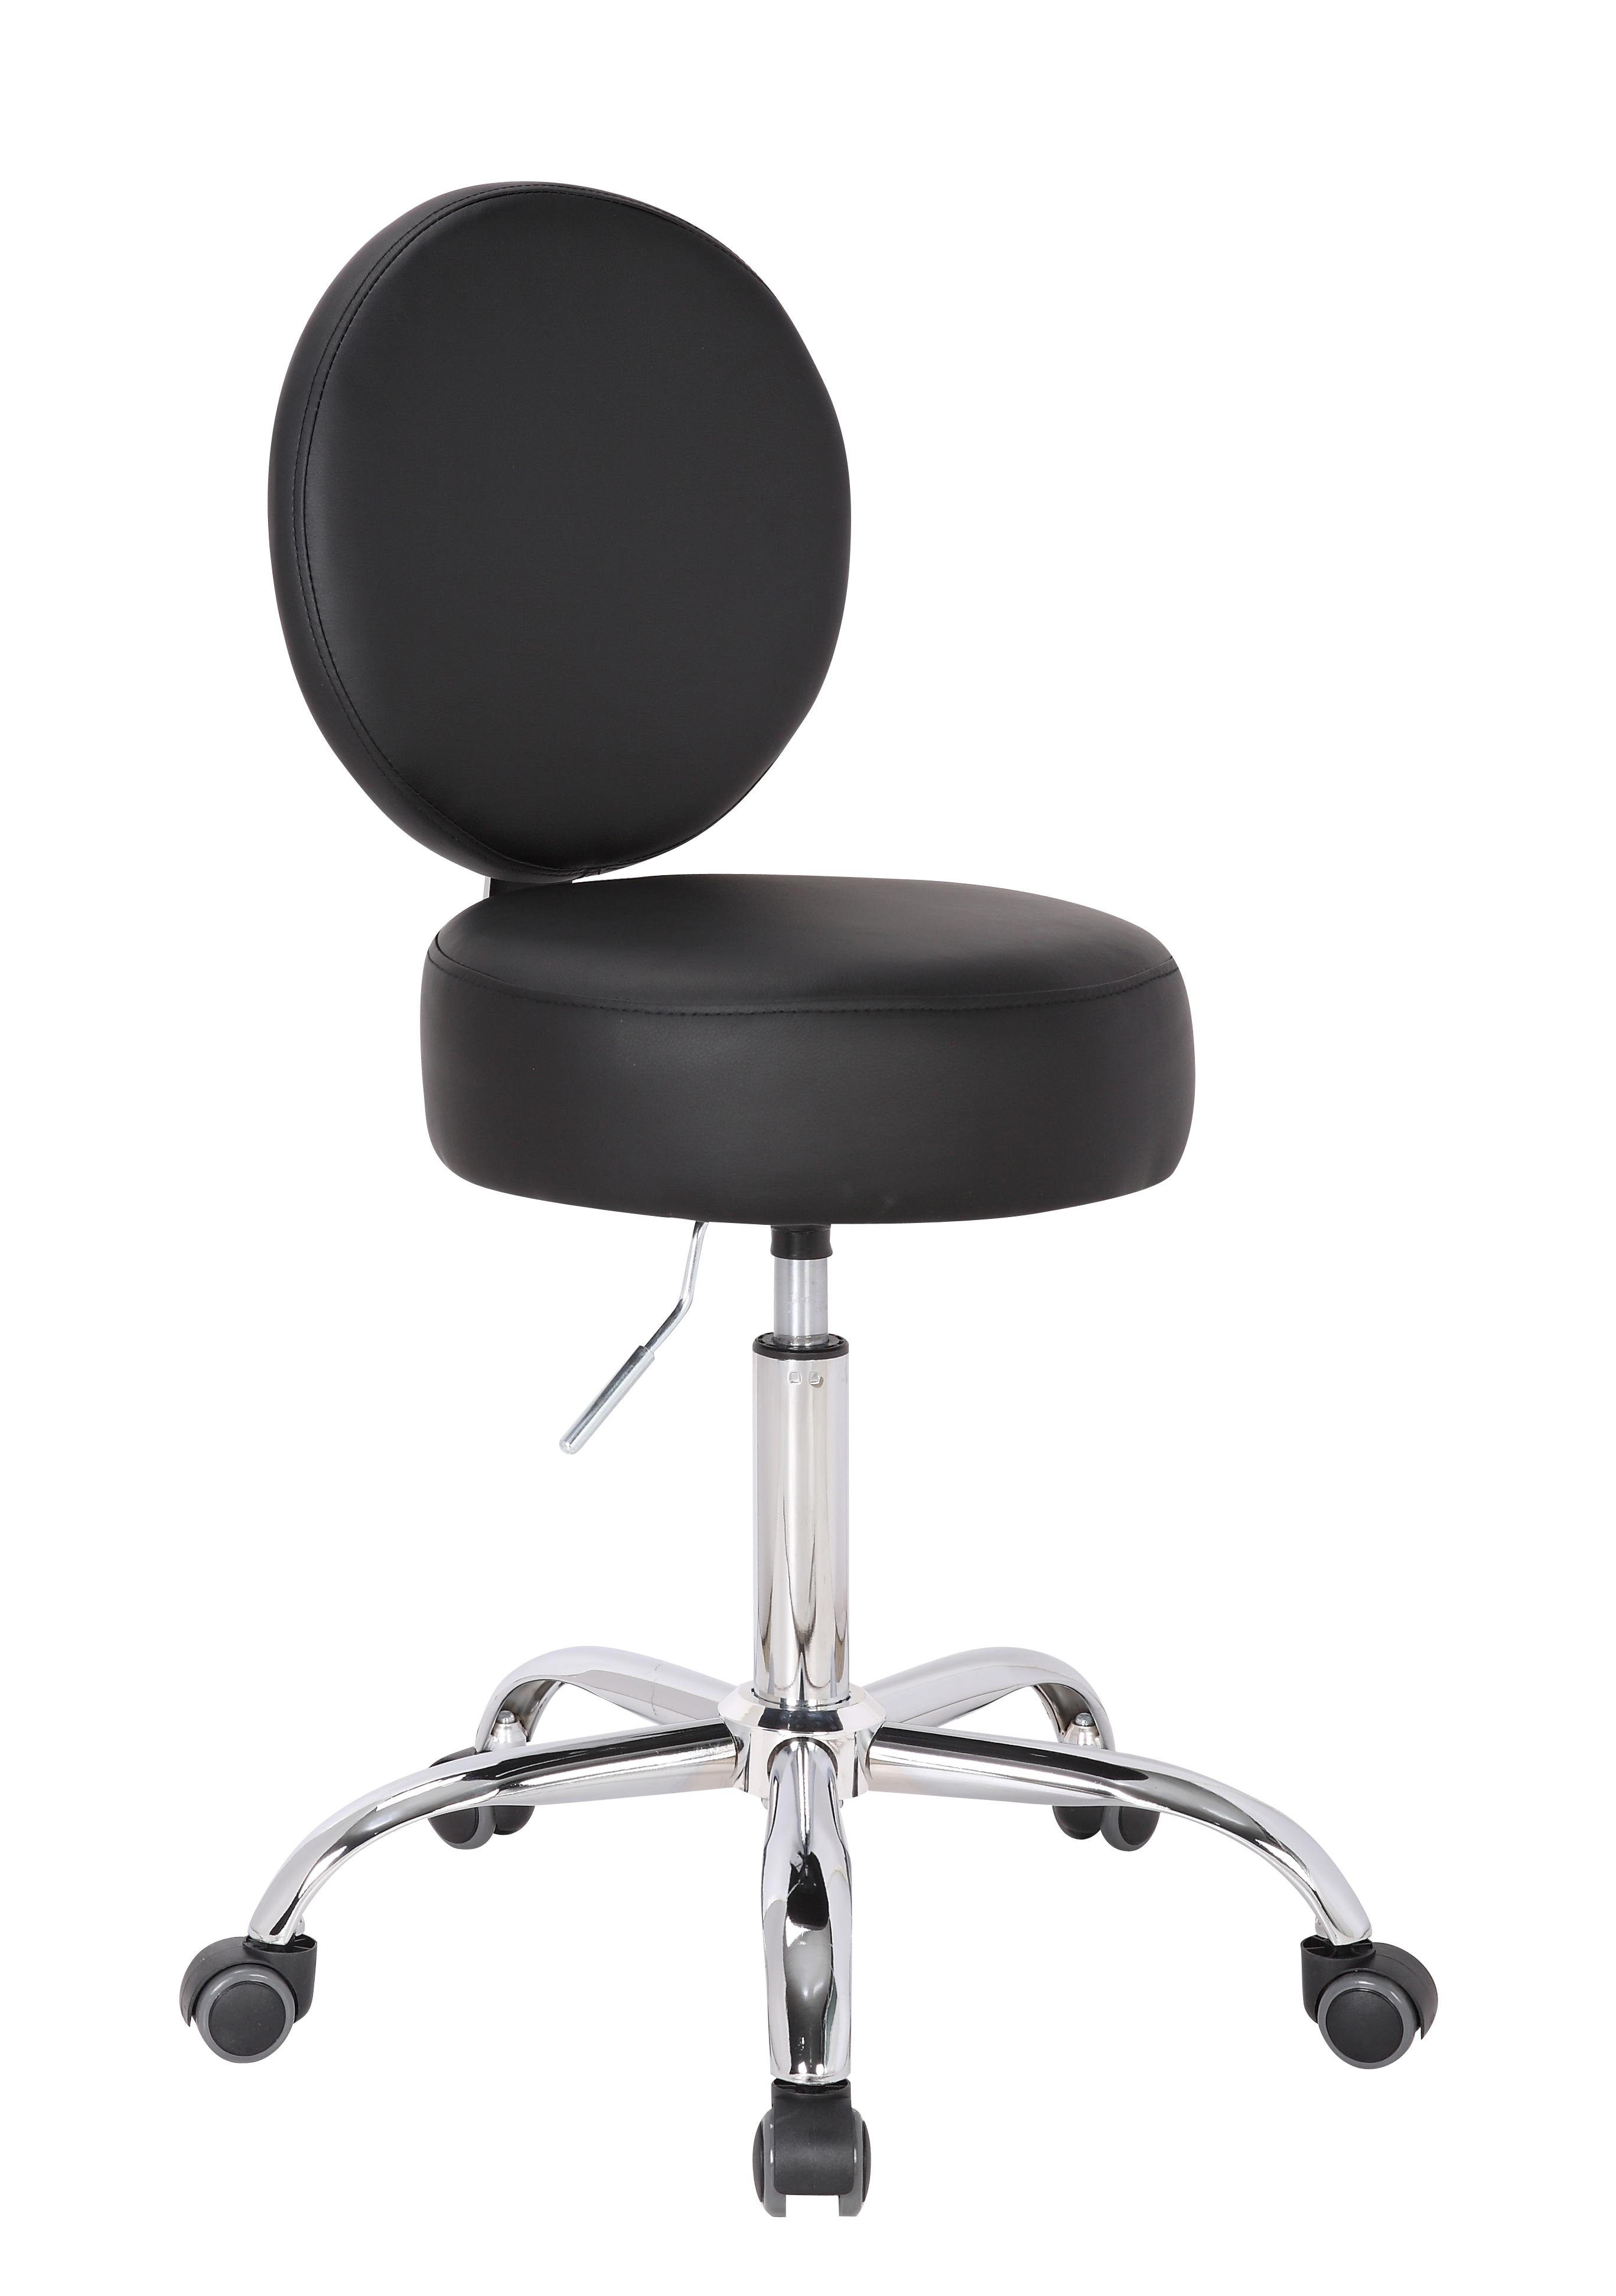 stuhlwelt24 sitzm bel von 1stuff profi rollhocker big squash mit lehne sitzh he 54 71cm. Black Bedroom Furniture Sets. Home Design Ideas